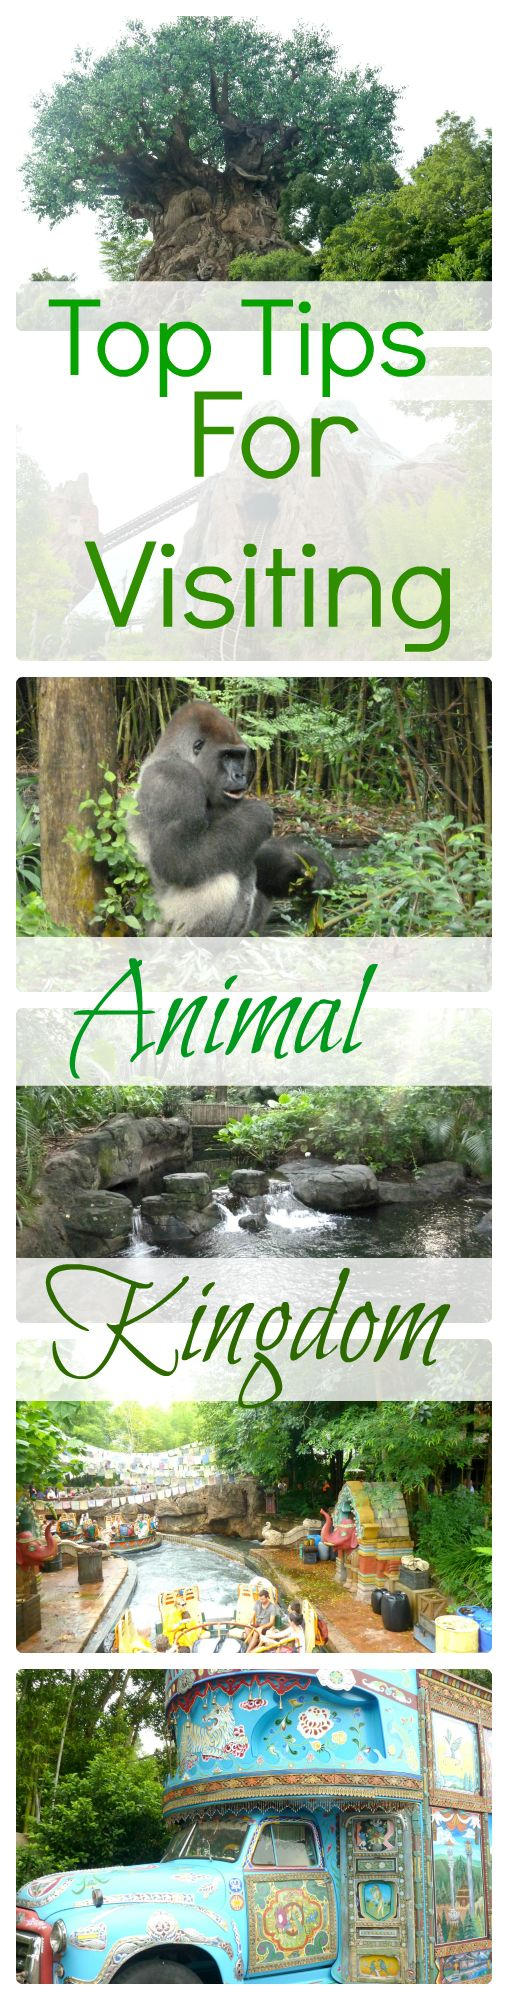 Top Tips for visiting Animal kingdom Walt Disney World